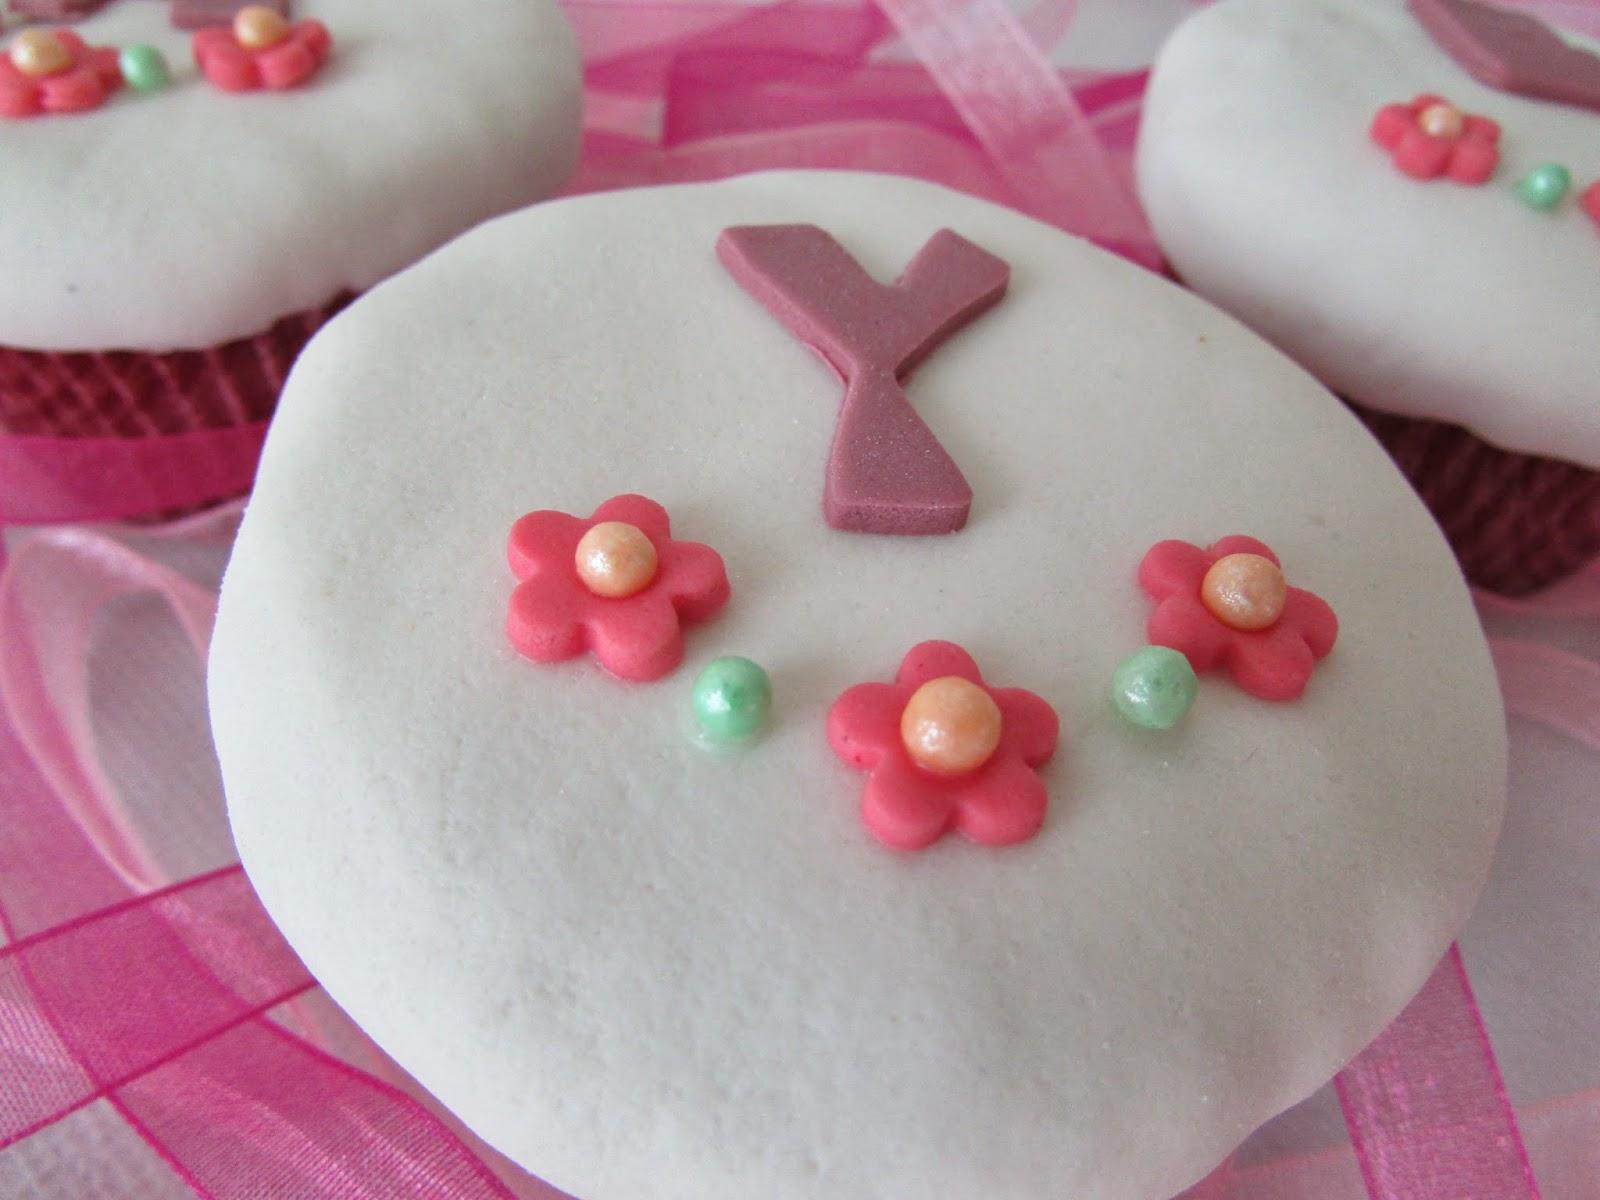 letras-fondat-cupcakes-perlas-pegamento-comestible